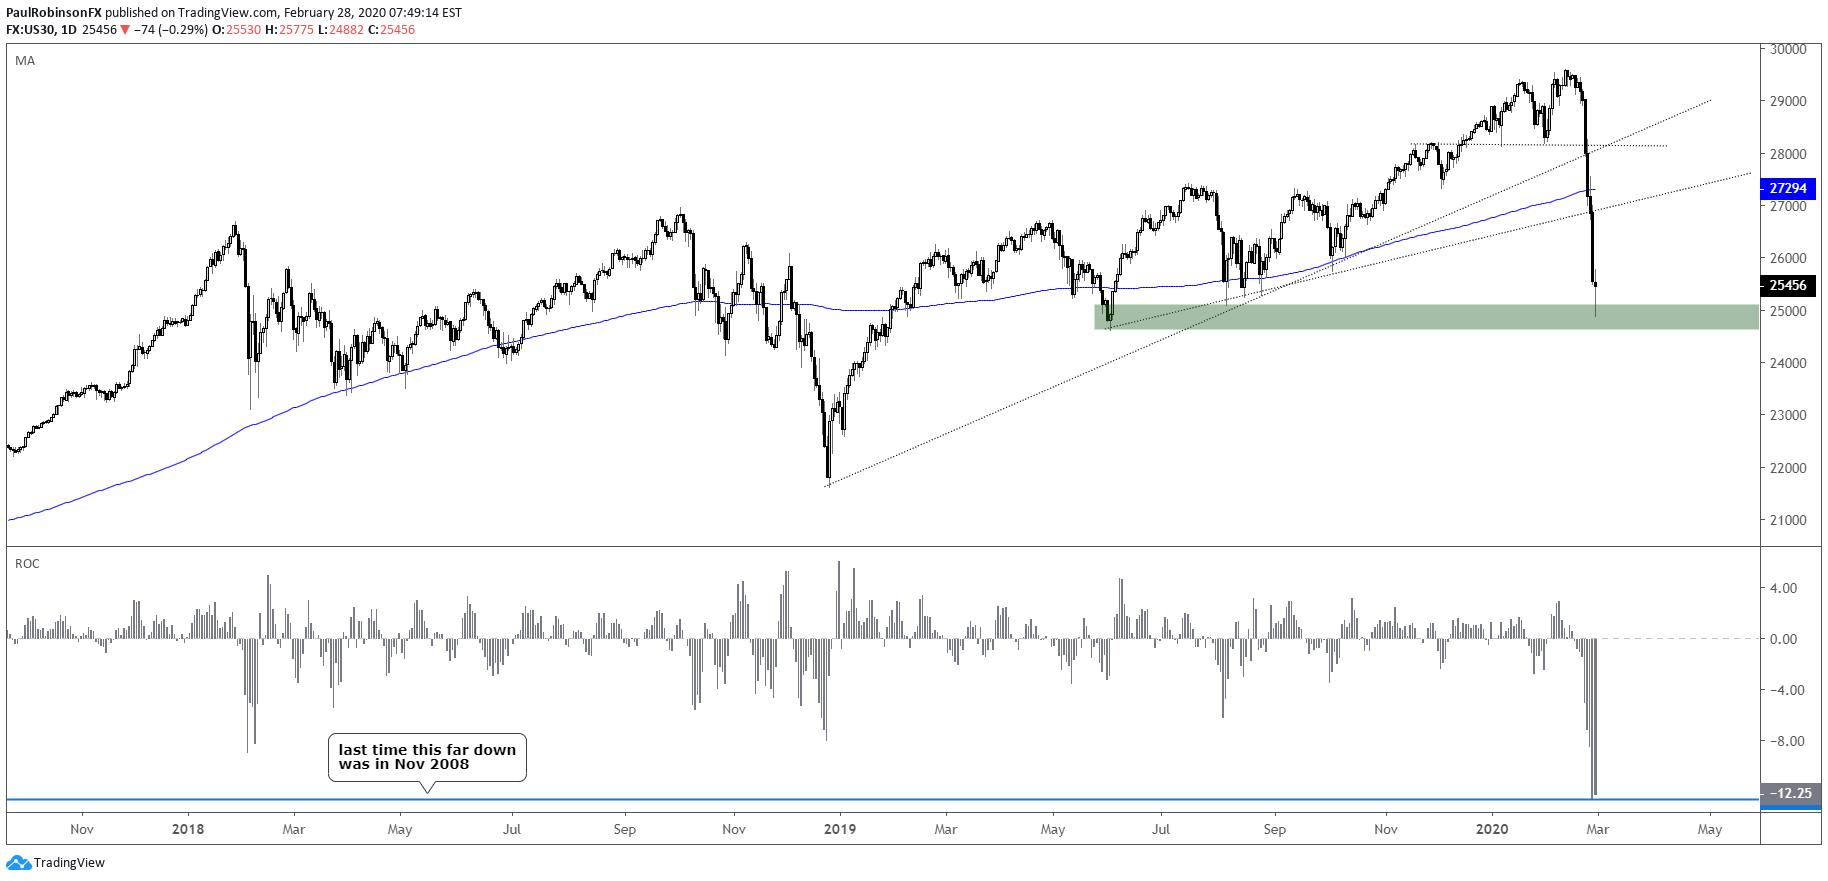 Dow Jones Chart - Dow Jones Correction Just Beginning, USDJPY Near Channel ... / 2 dow jones industrial average 30 index technical analysis.